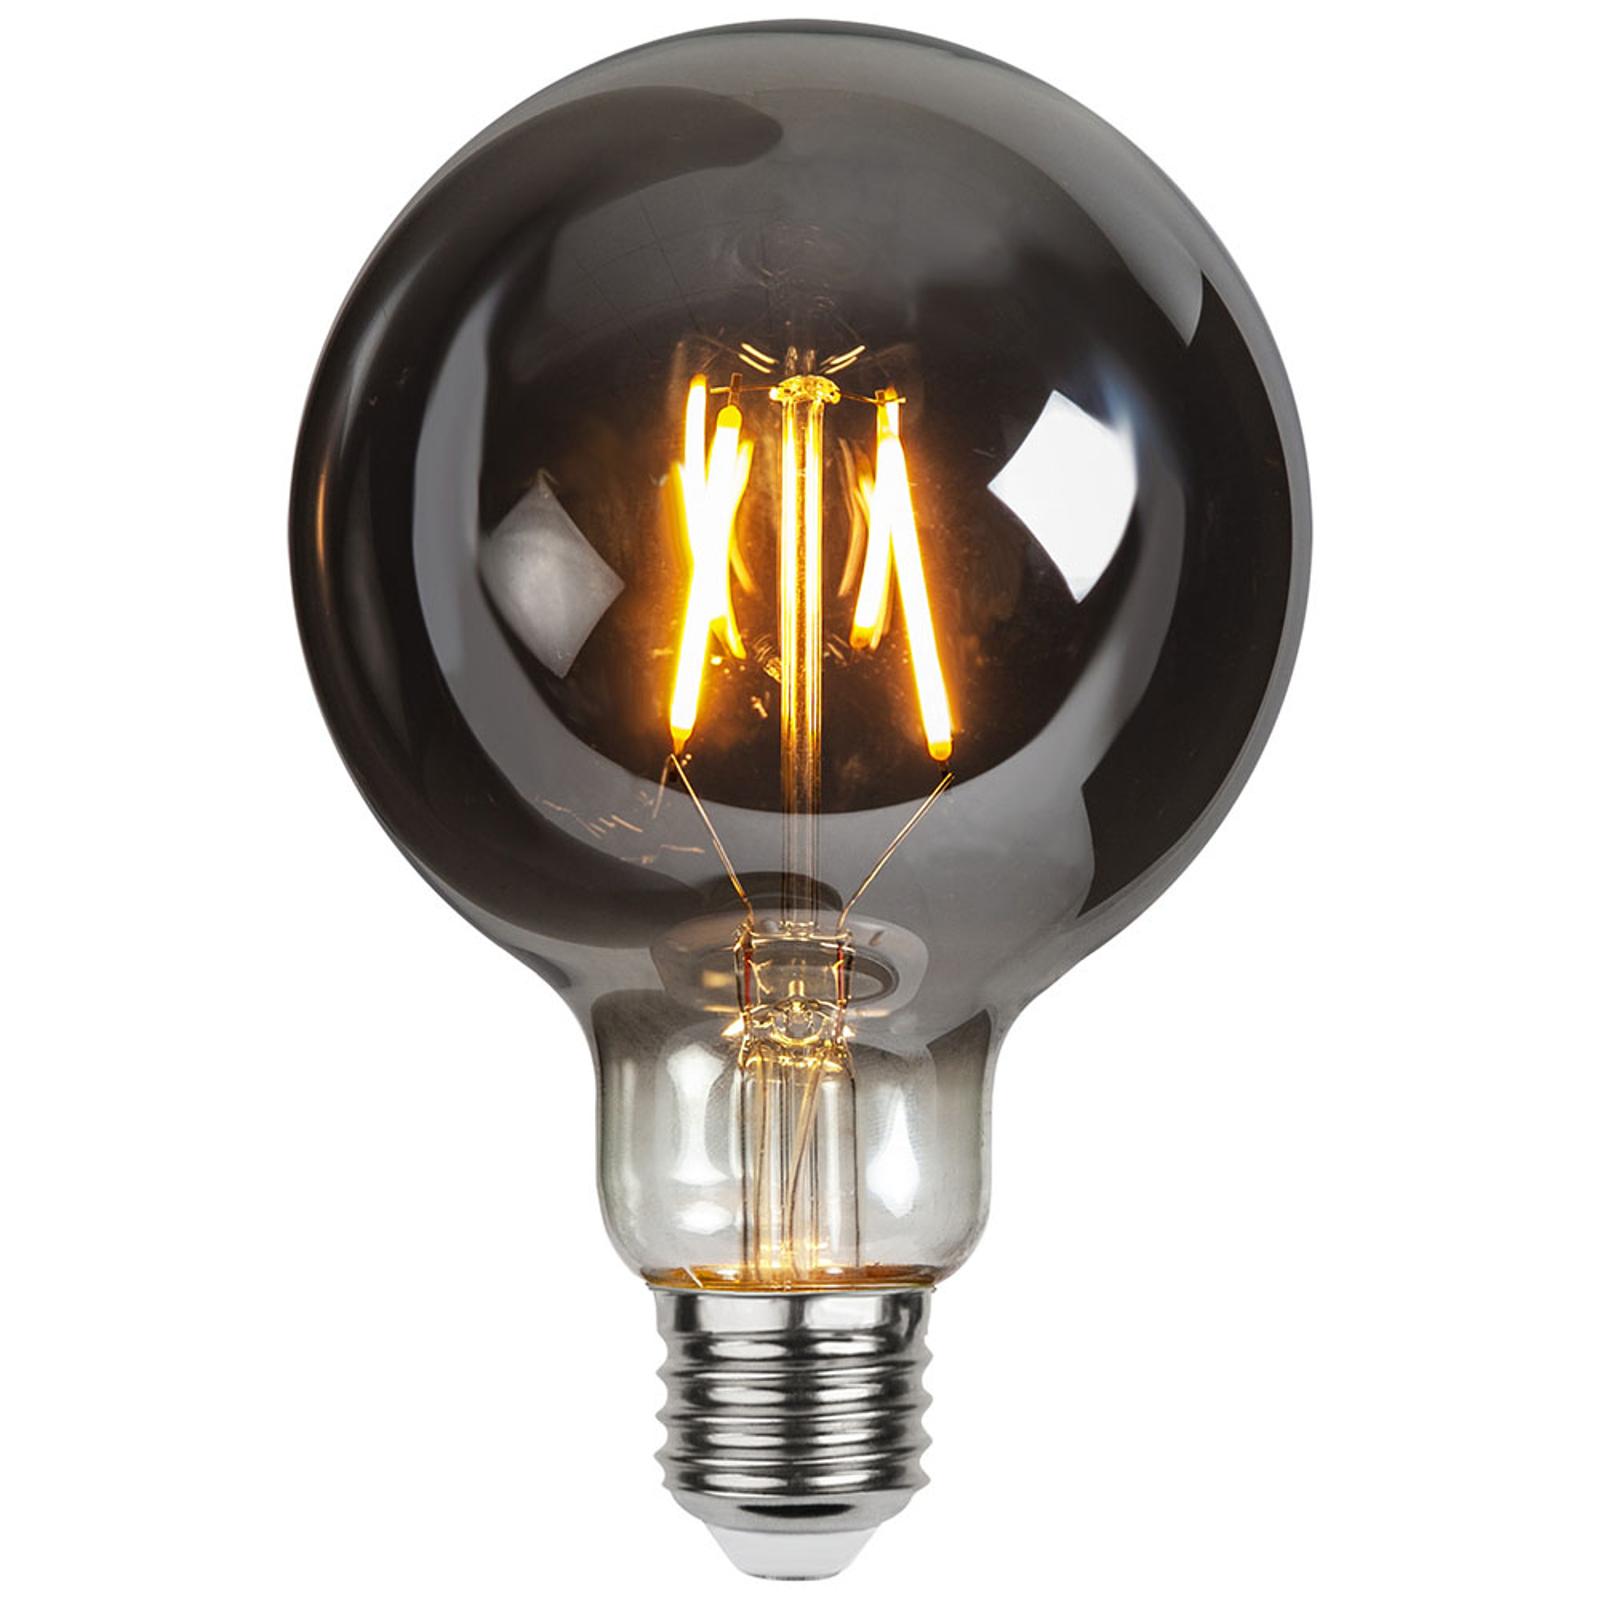 LED-globepære E27 1,8W Plain Smoke 2100K Ø 95mm